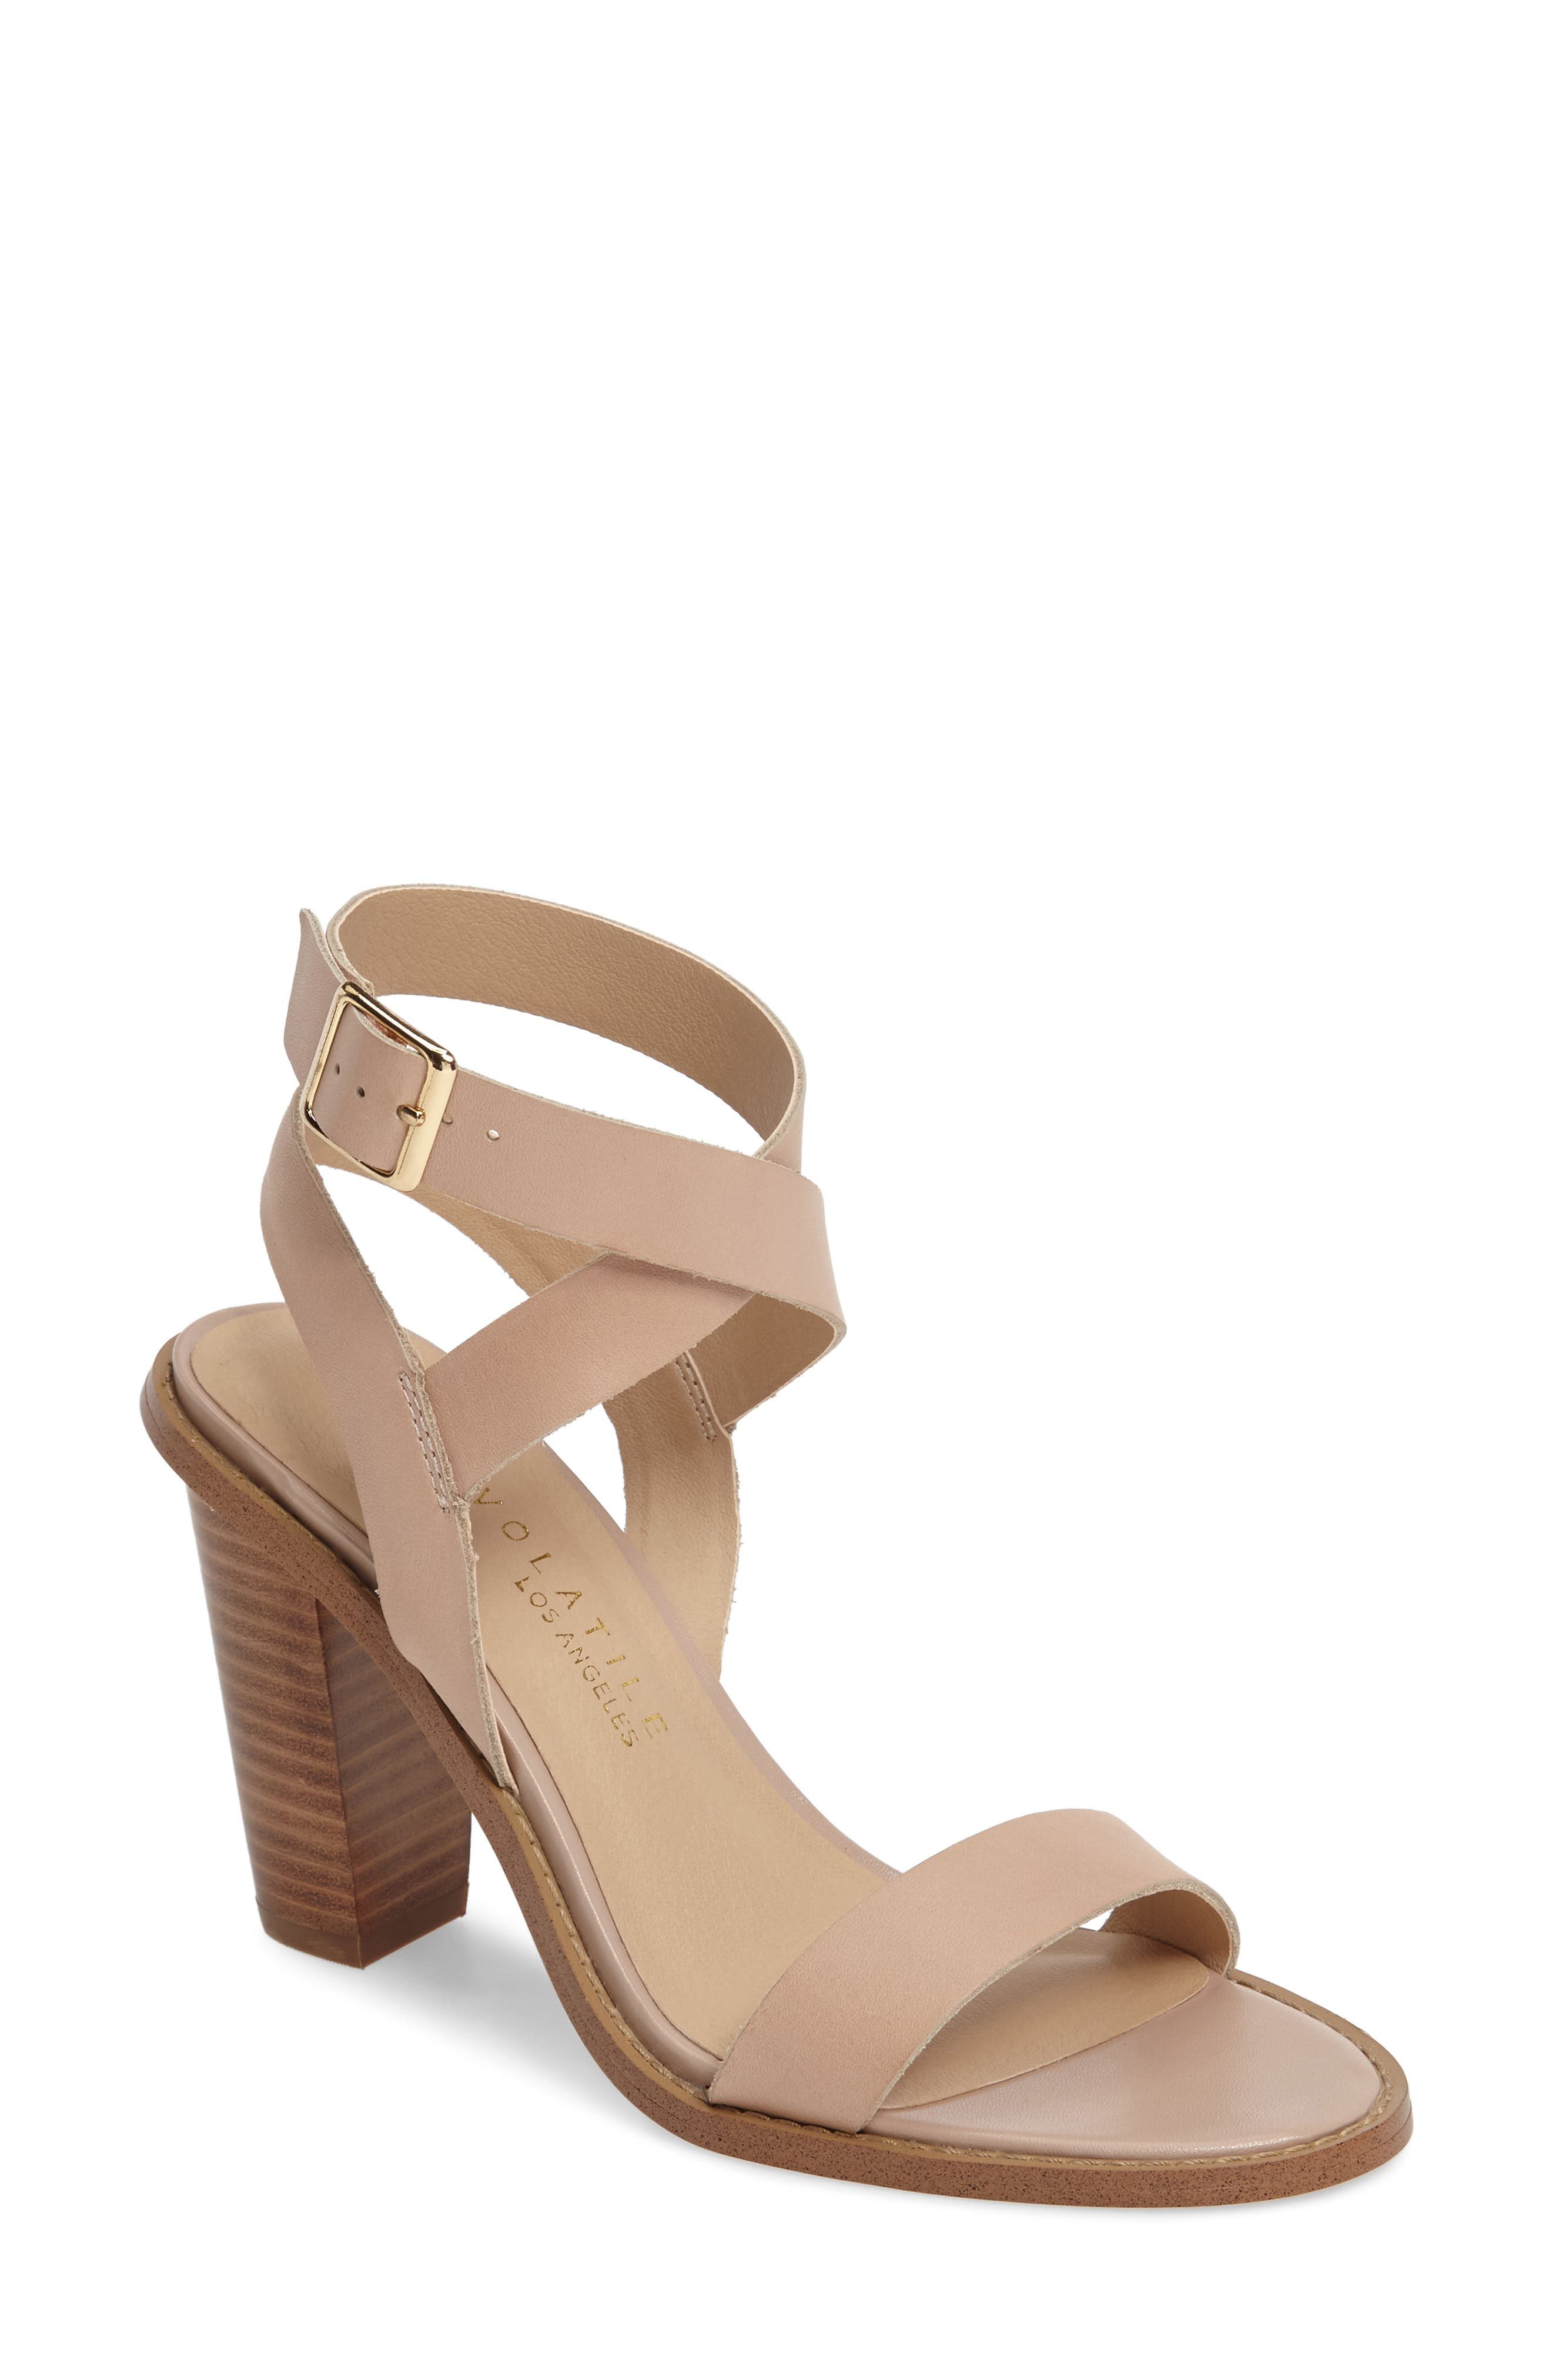 Alternate Image 1 Selected - Very Volatile Poshy Ankle Wrap Sandal (Women)